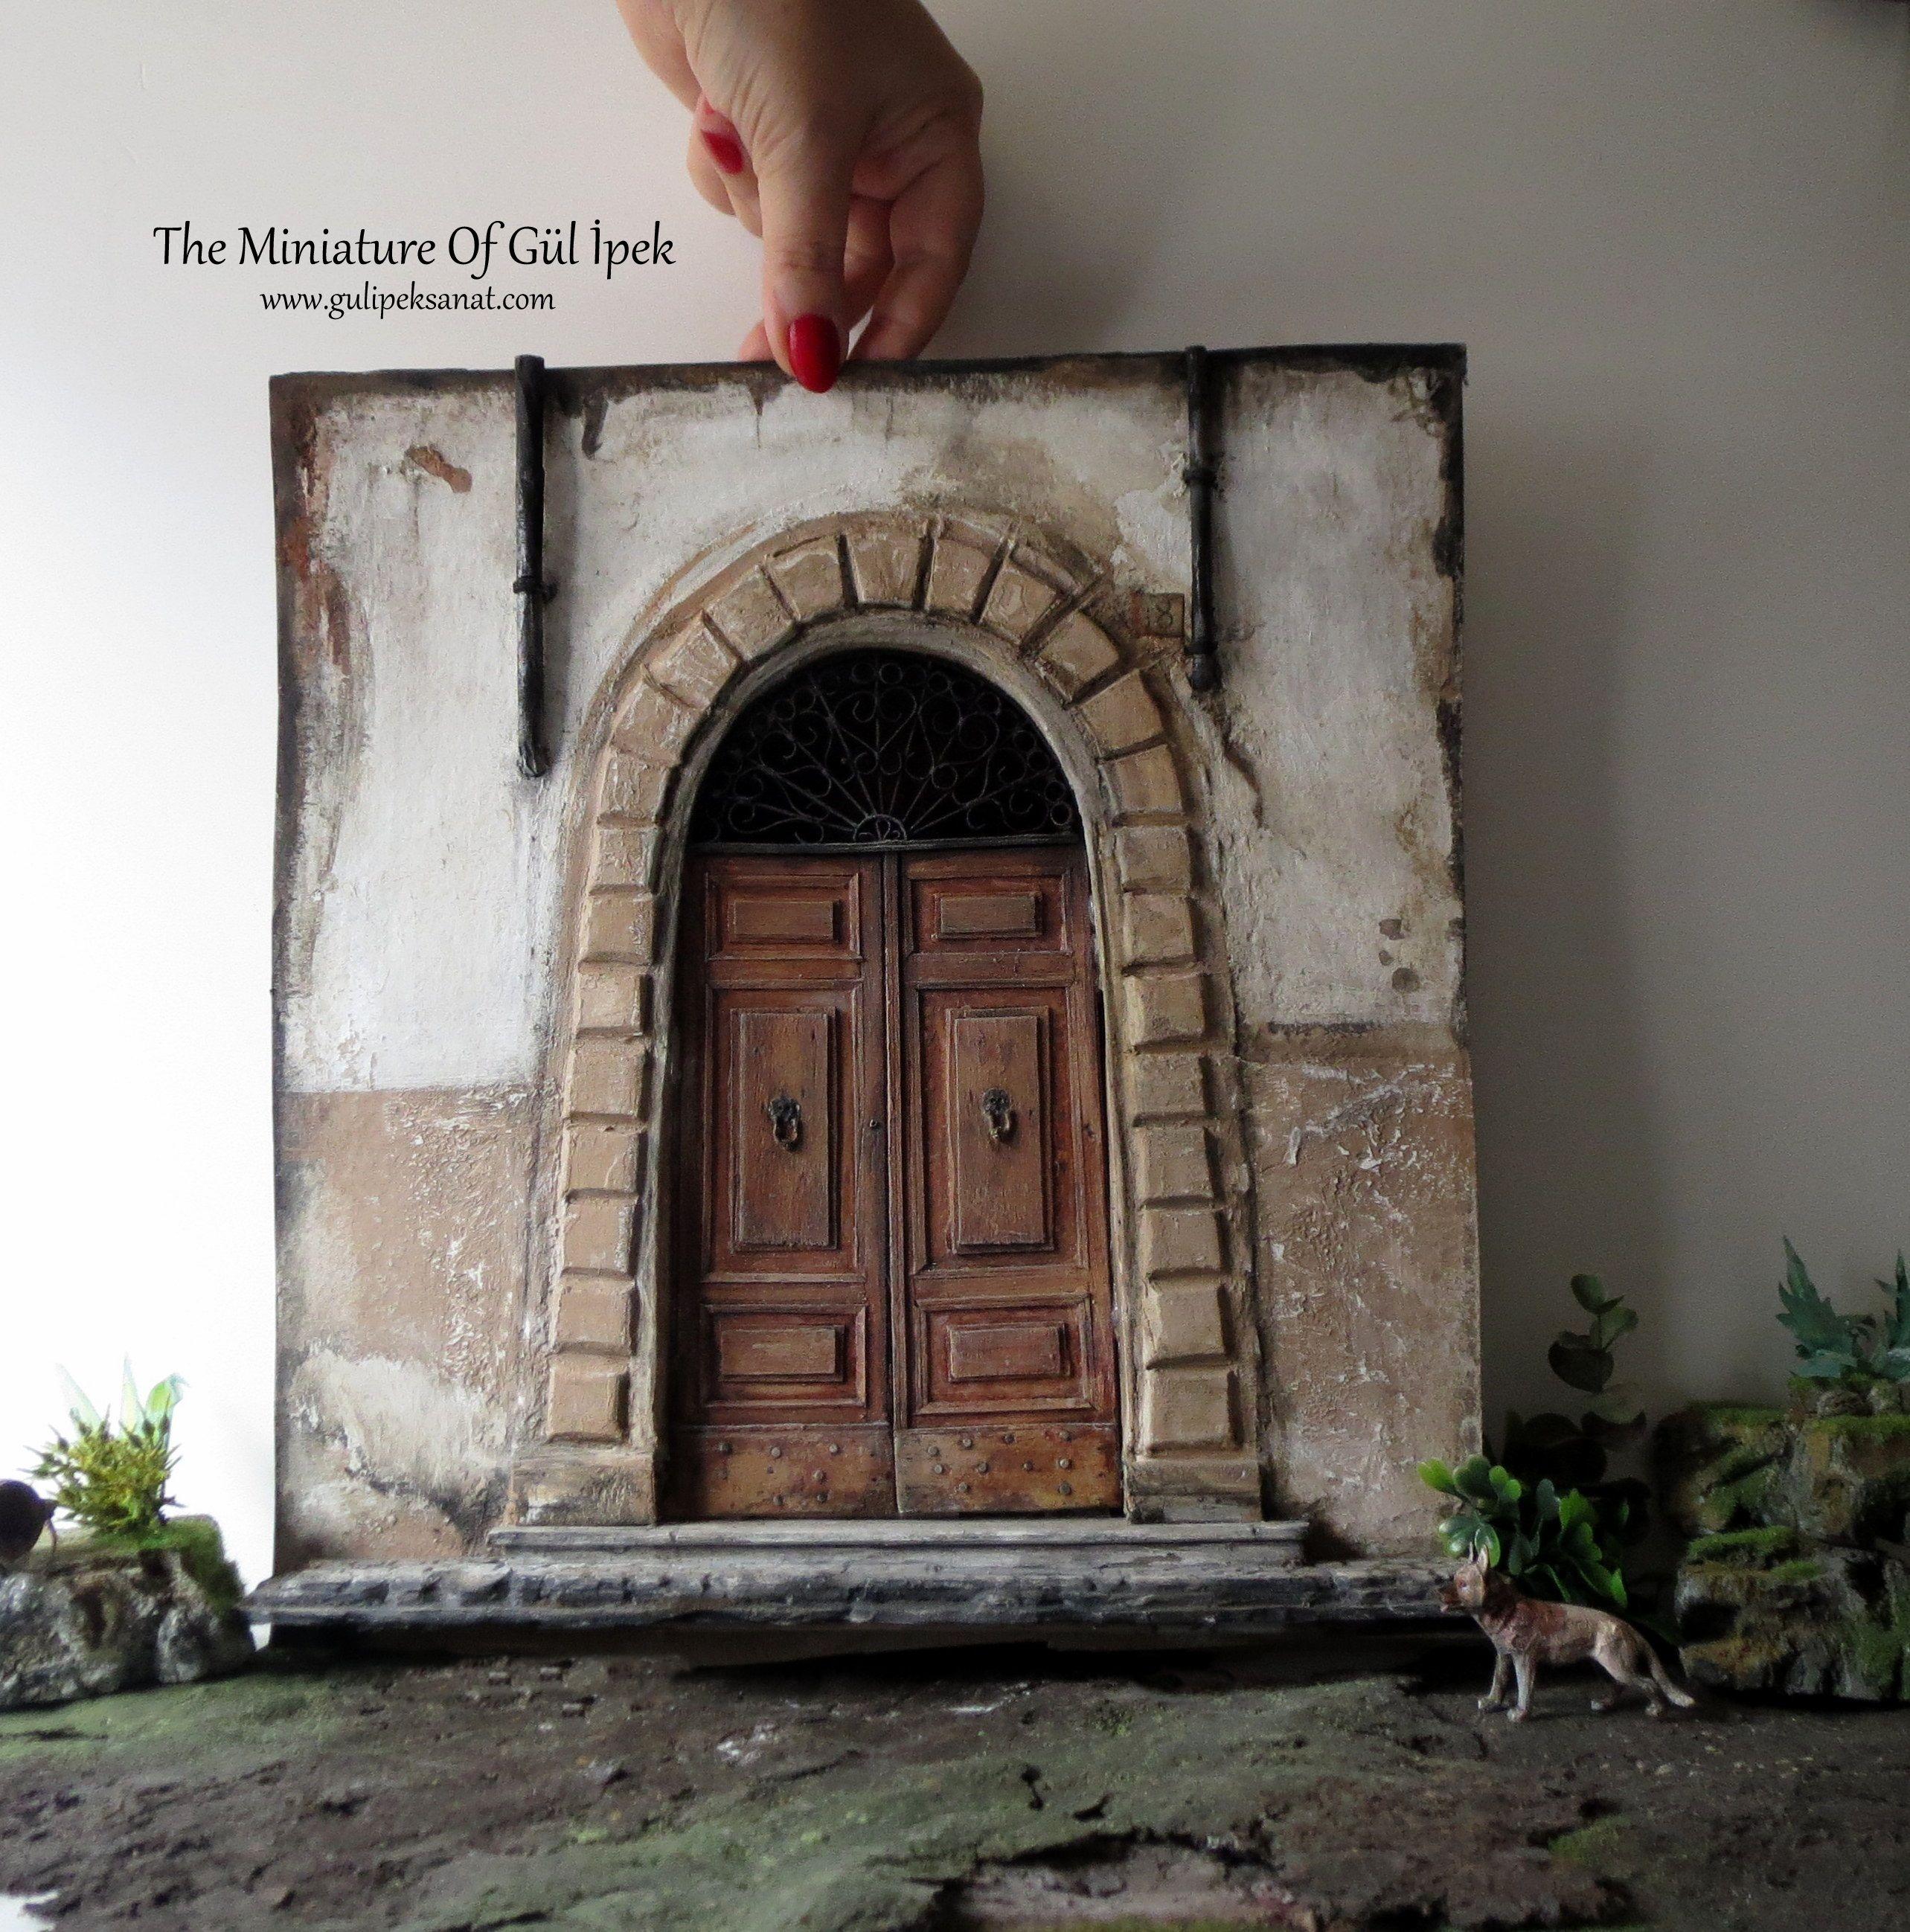 italy door drawing By Gül ipek #italy #old #doors #paper #gulipeksanat #handmade #art #arte #porta desing #fabriona #italya #legno #mini #minyatür ... & italy door drawing By Gül ipek #italy #old #doors #paper ... pezcame.com